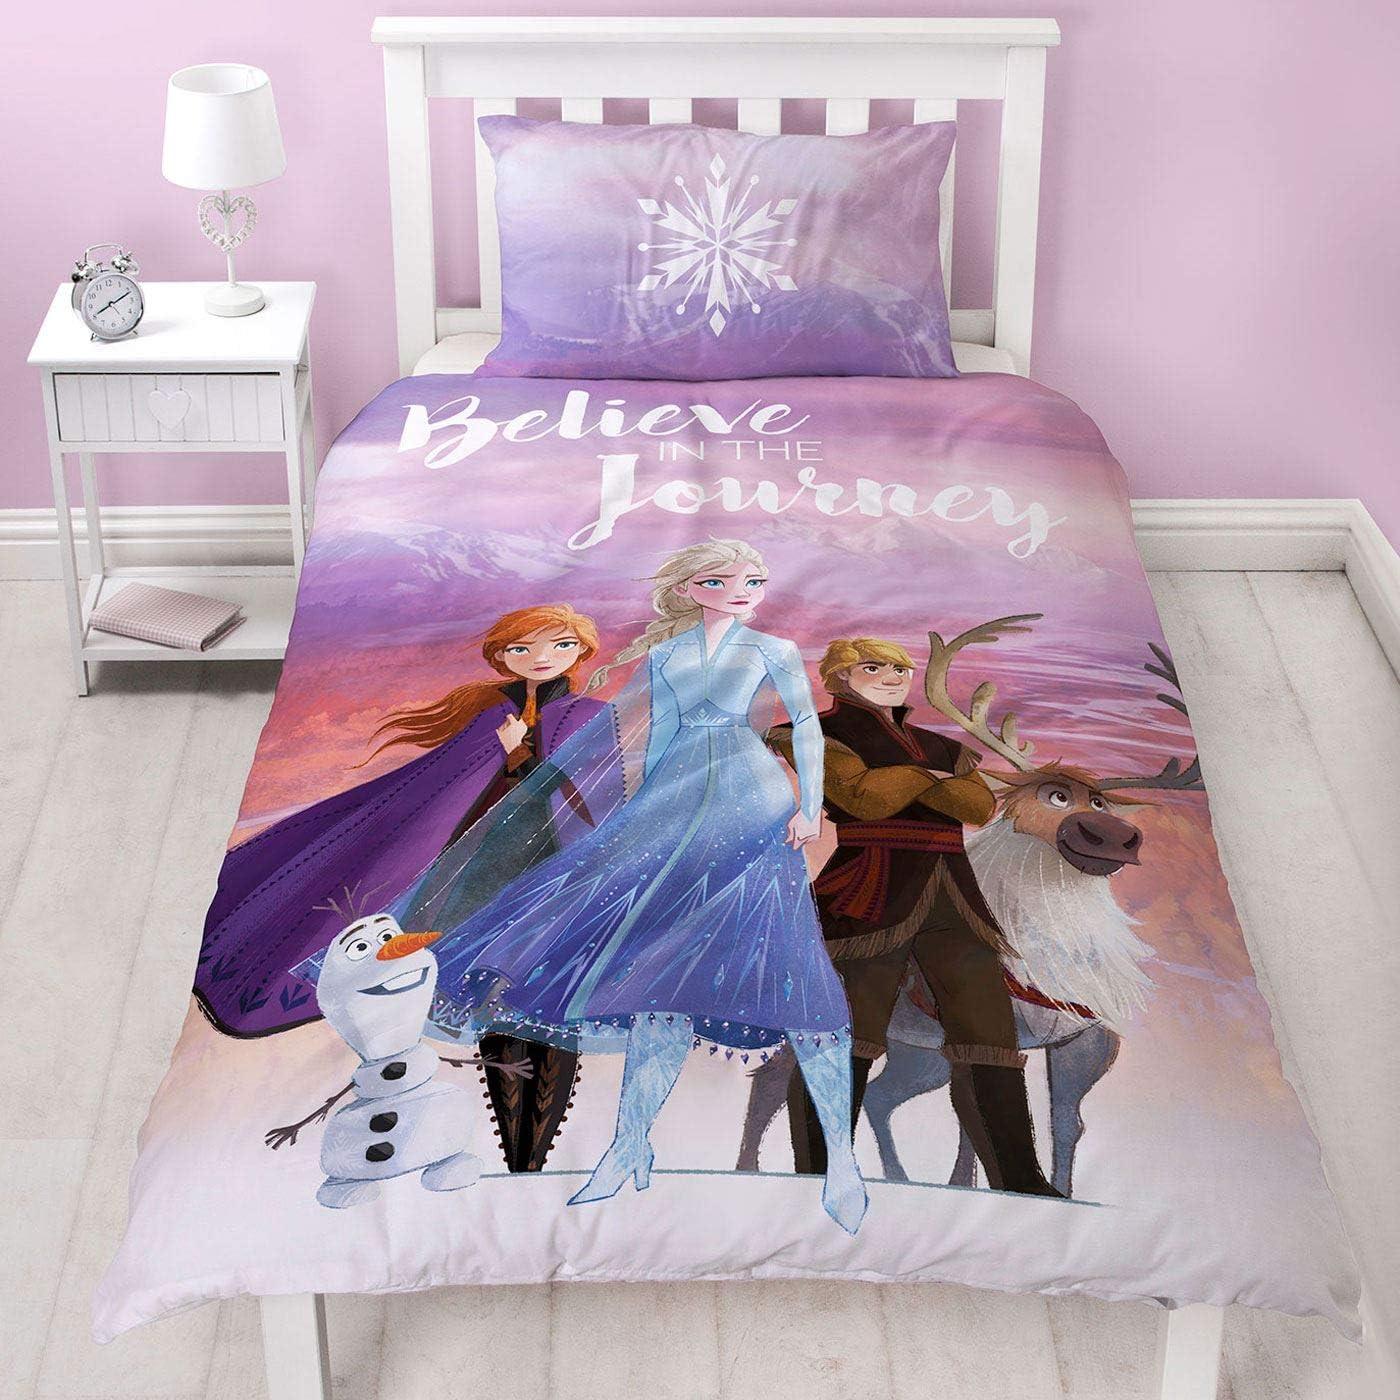 Buy Disney Frozen 2 Elsa & Anna Bedding